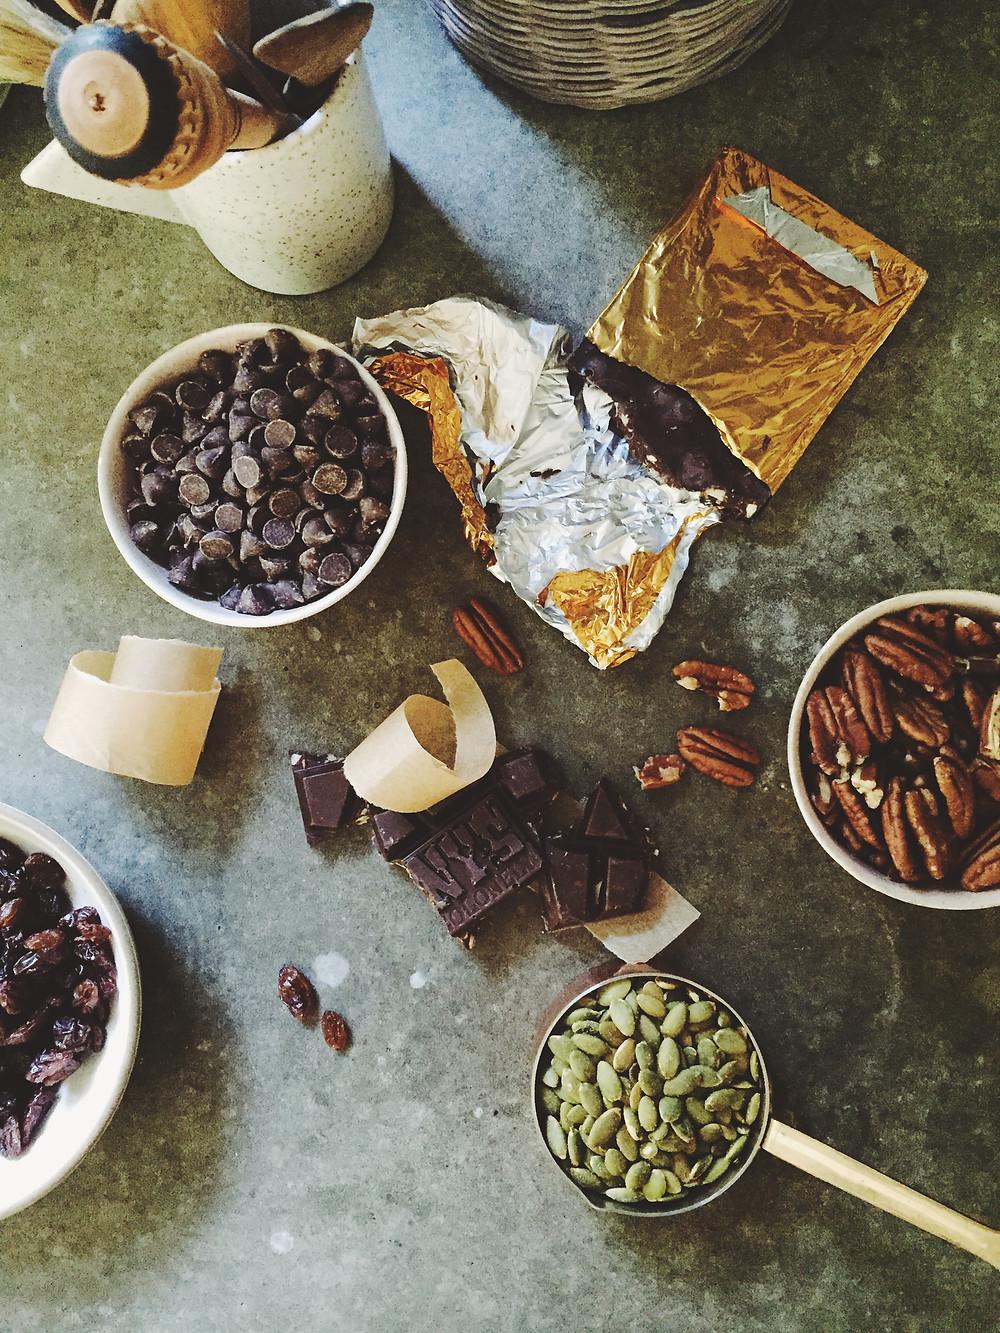 celebration cookie recipe from Magic dream life